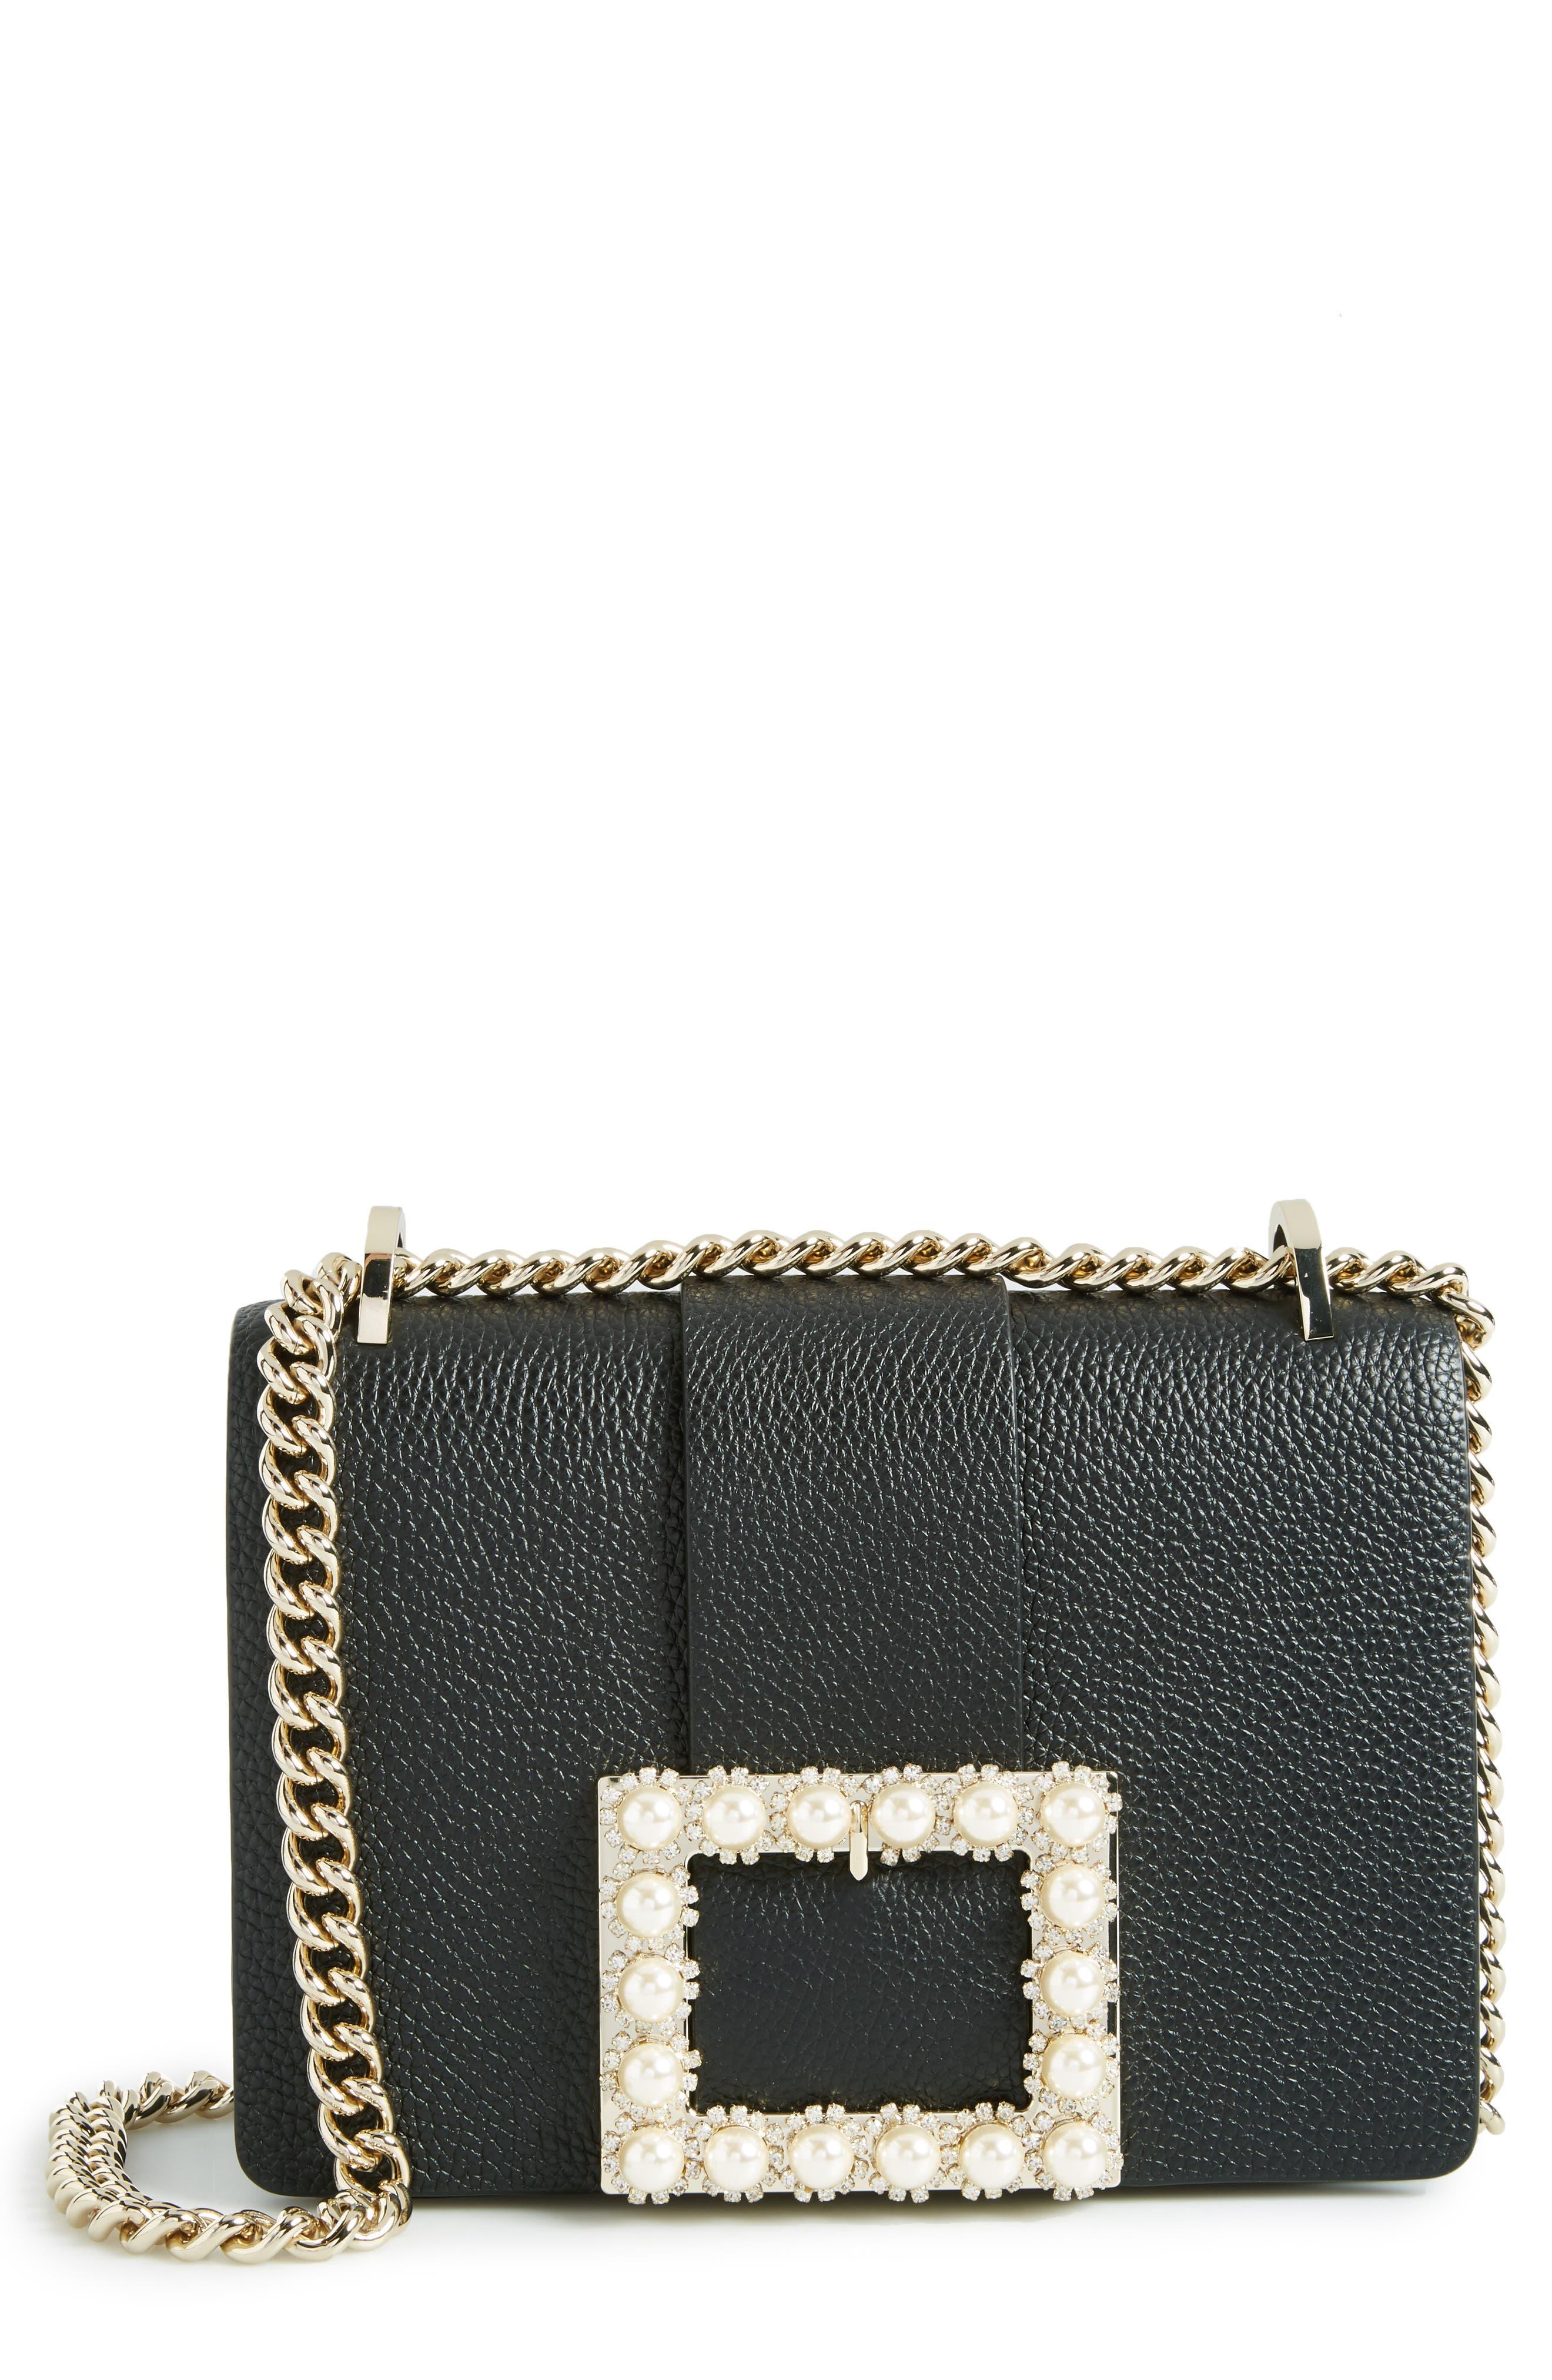 madison knollwood drive - buckle marci leather shoulder bag,                             Main thumbnail 1, color,                             001